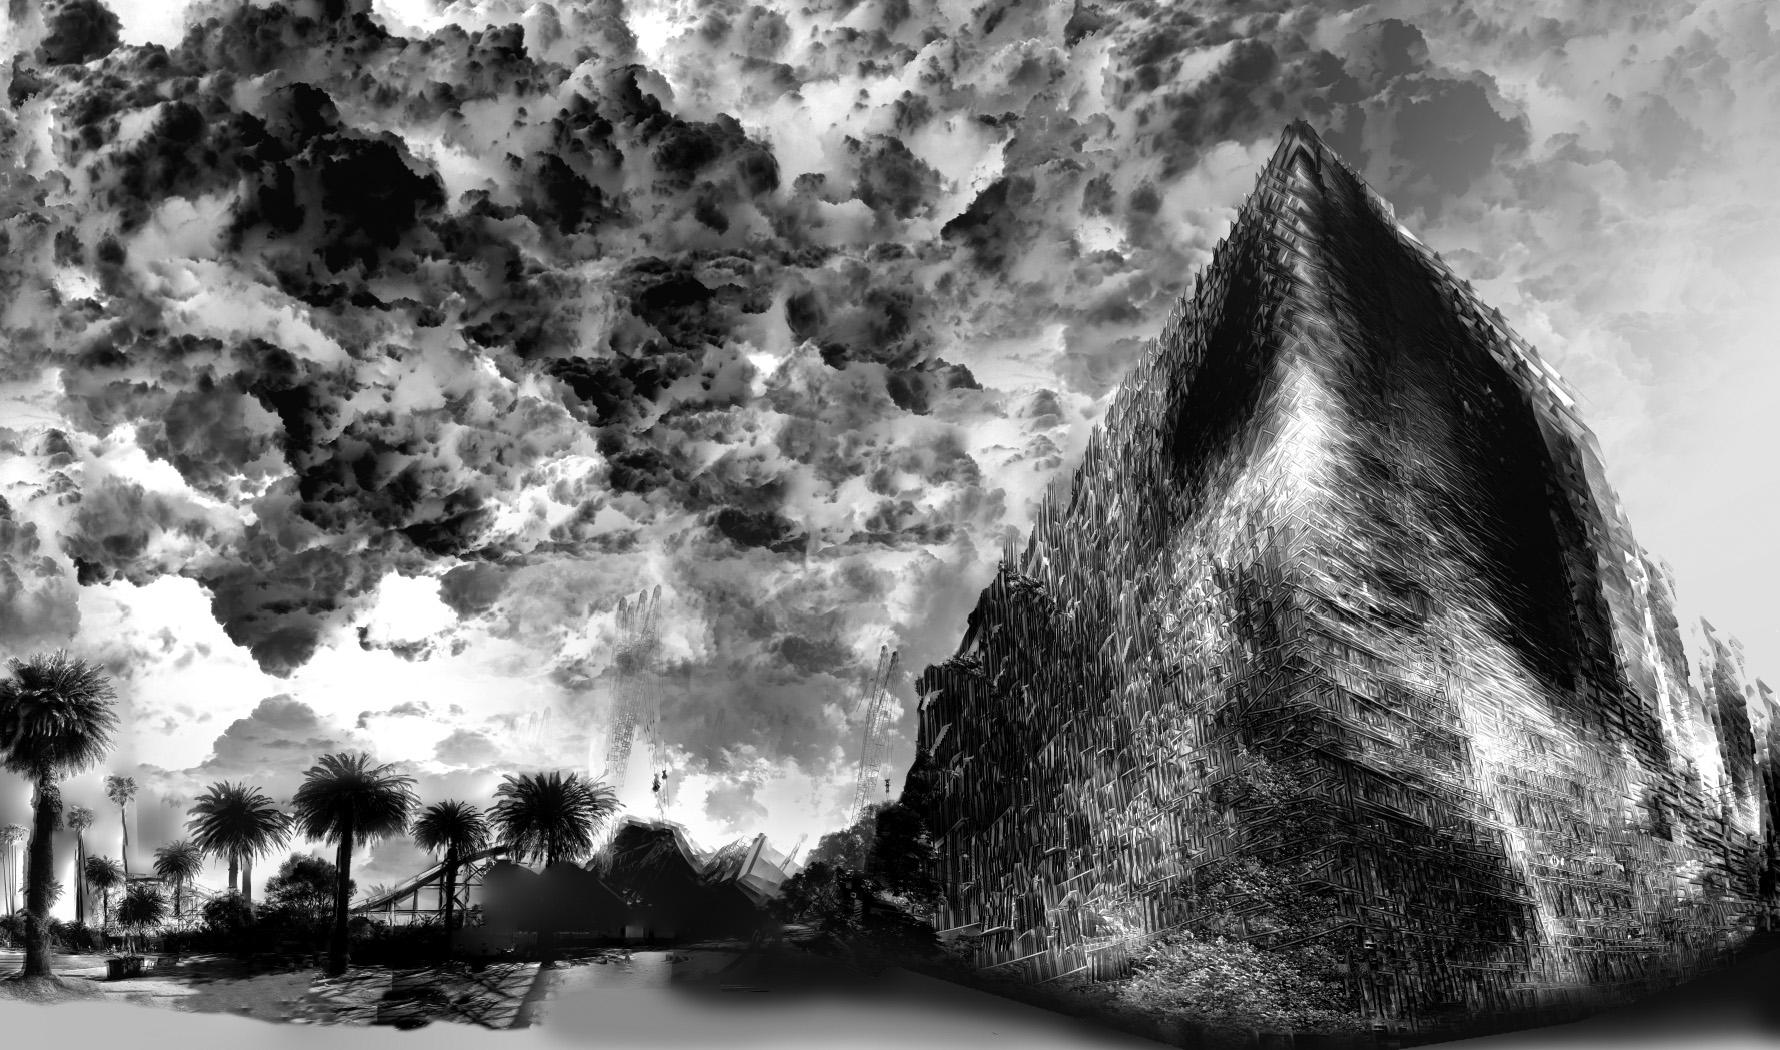 Construction of the Pyramid - St Kilda